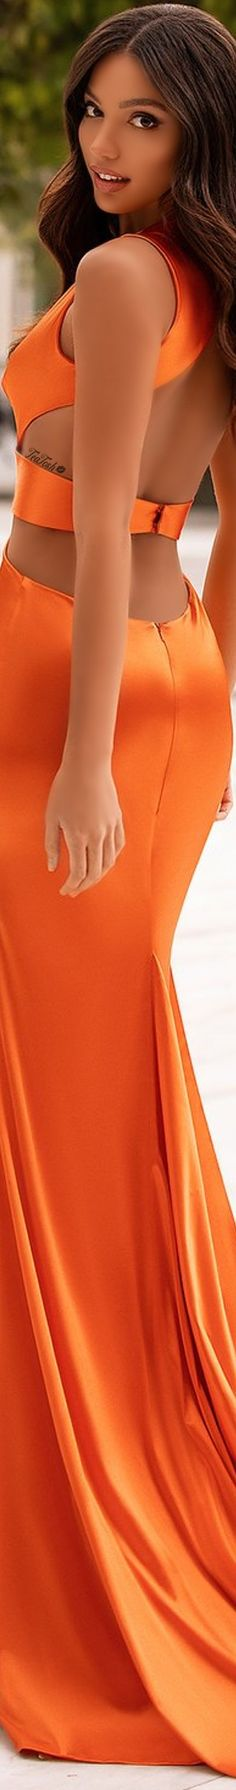 ❈Téa Tosh❈ #AandNLuxe #teatosh #VeridianaAssunçã Lobster Party, Orange Color, Label, Formal Dresses, Fashion, Formal Gowns, Moda, Fashion Styles, Formal Dress